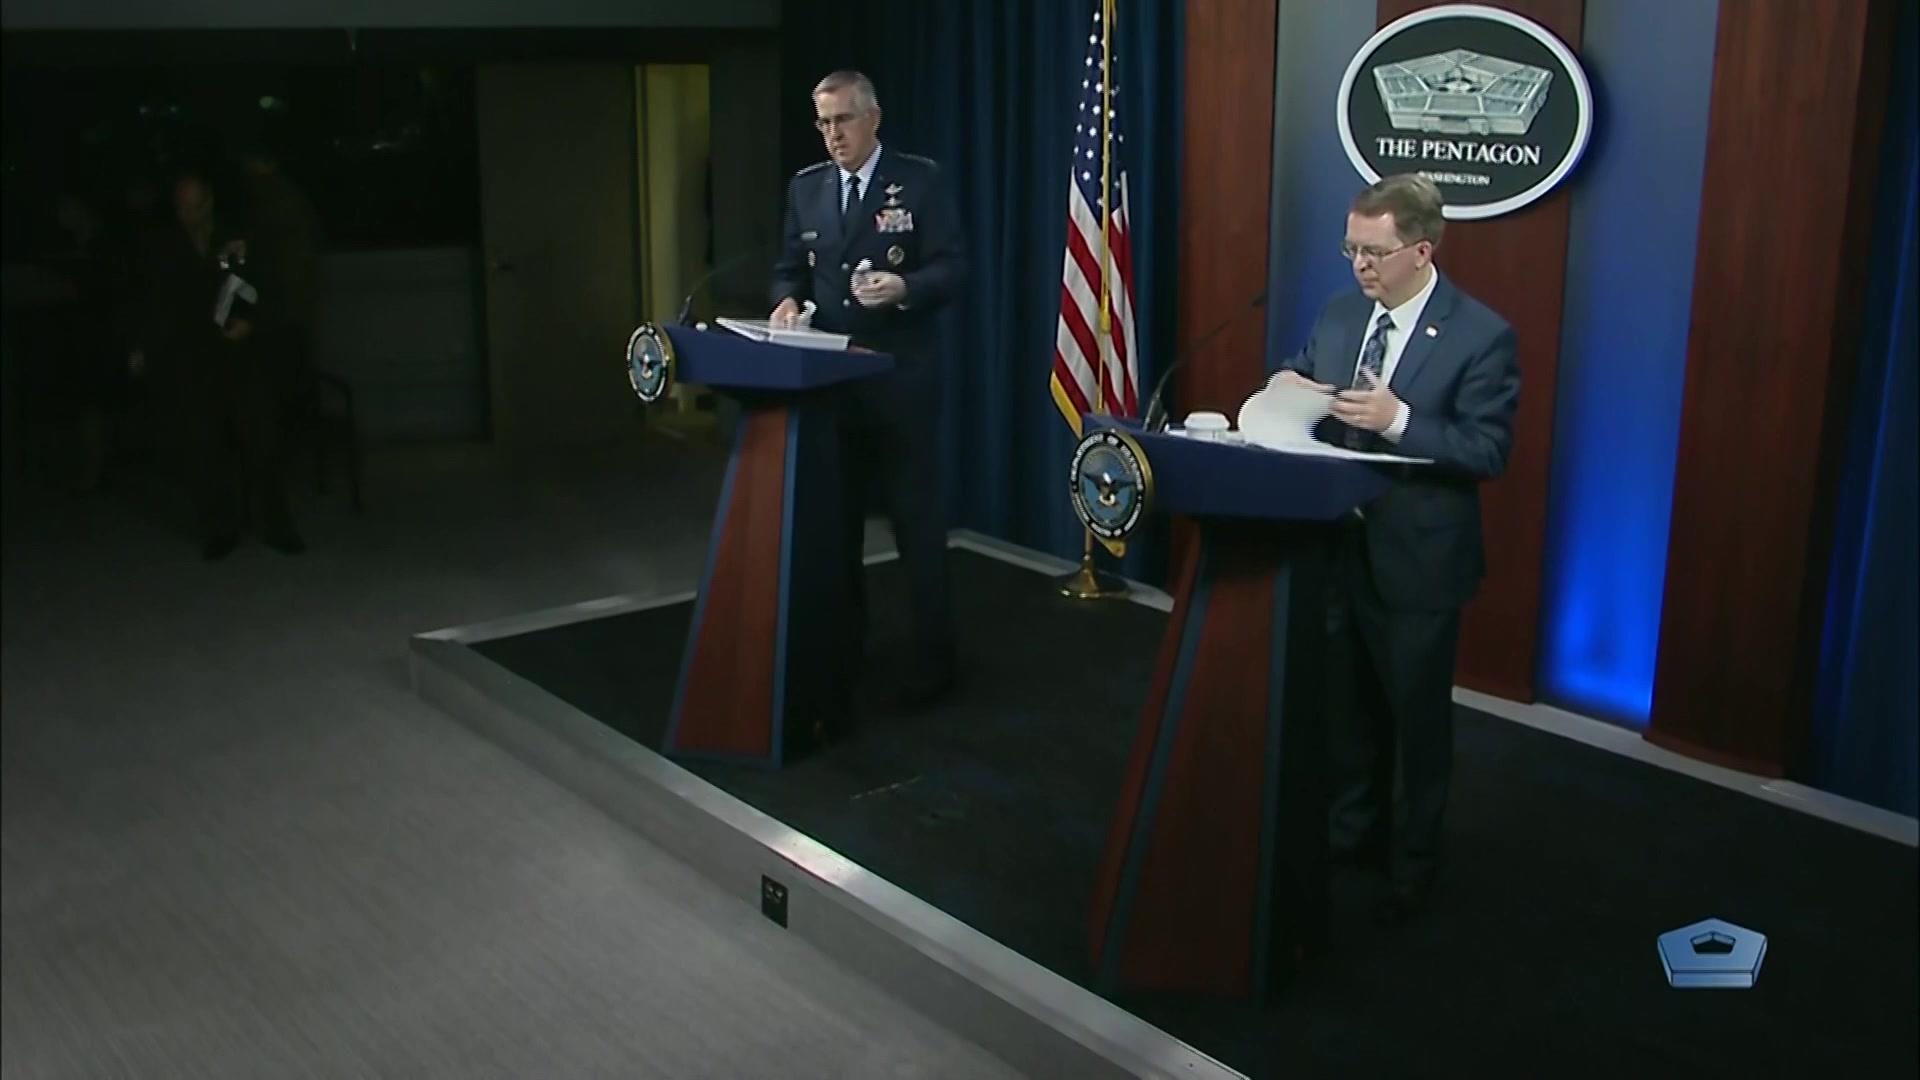 Deputy Defense Secretary David L. Norquist and Air Force Gen. John E. Hyten stand at lecterns.